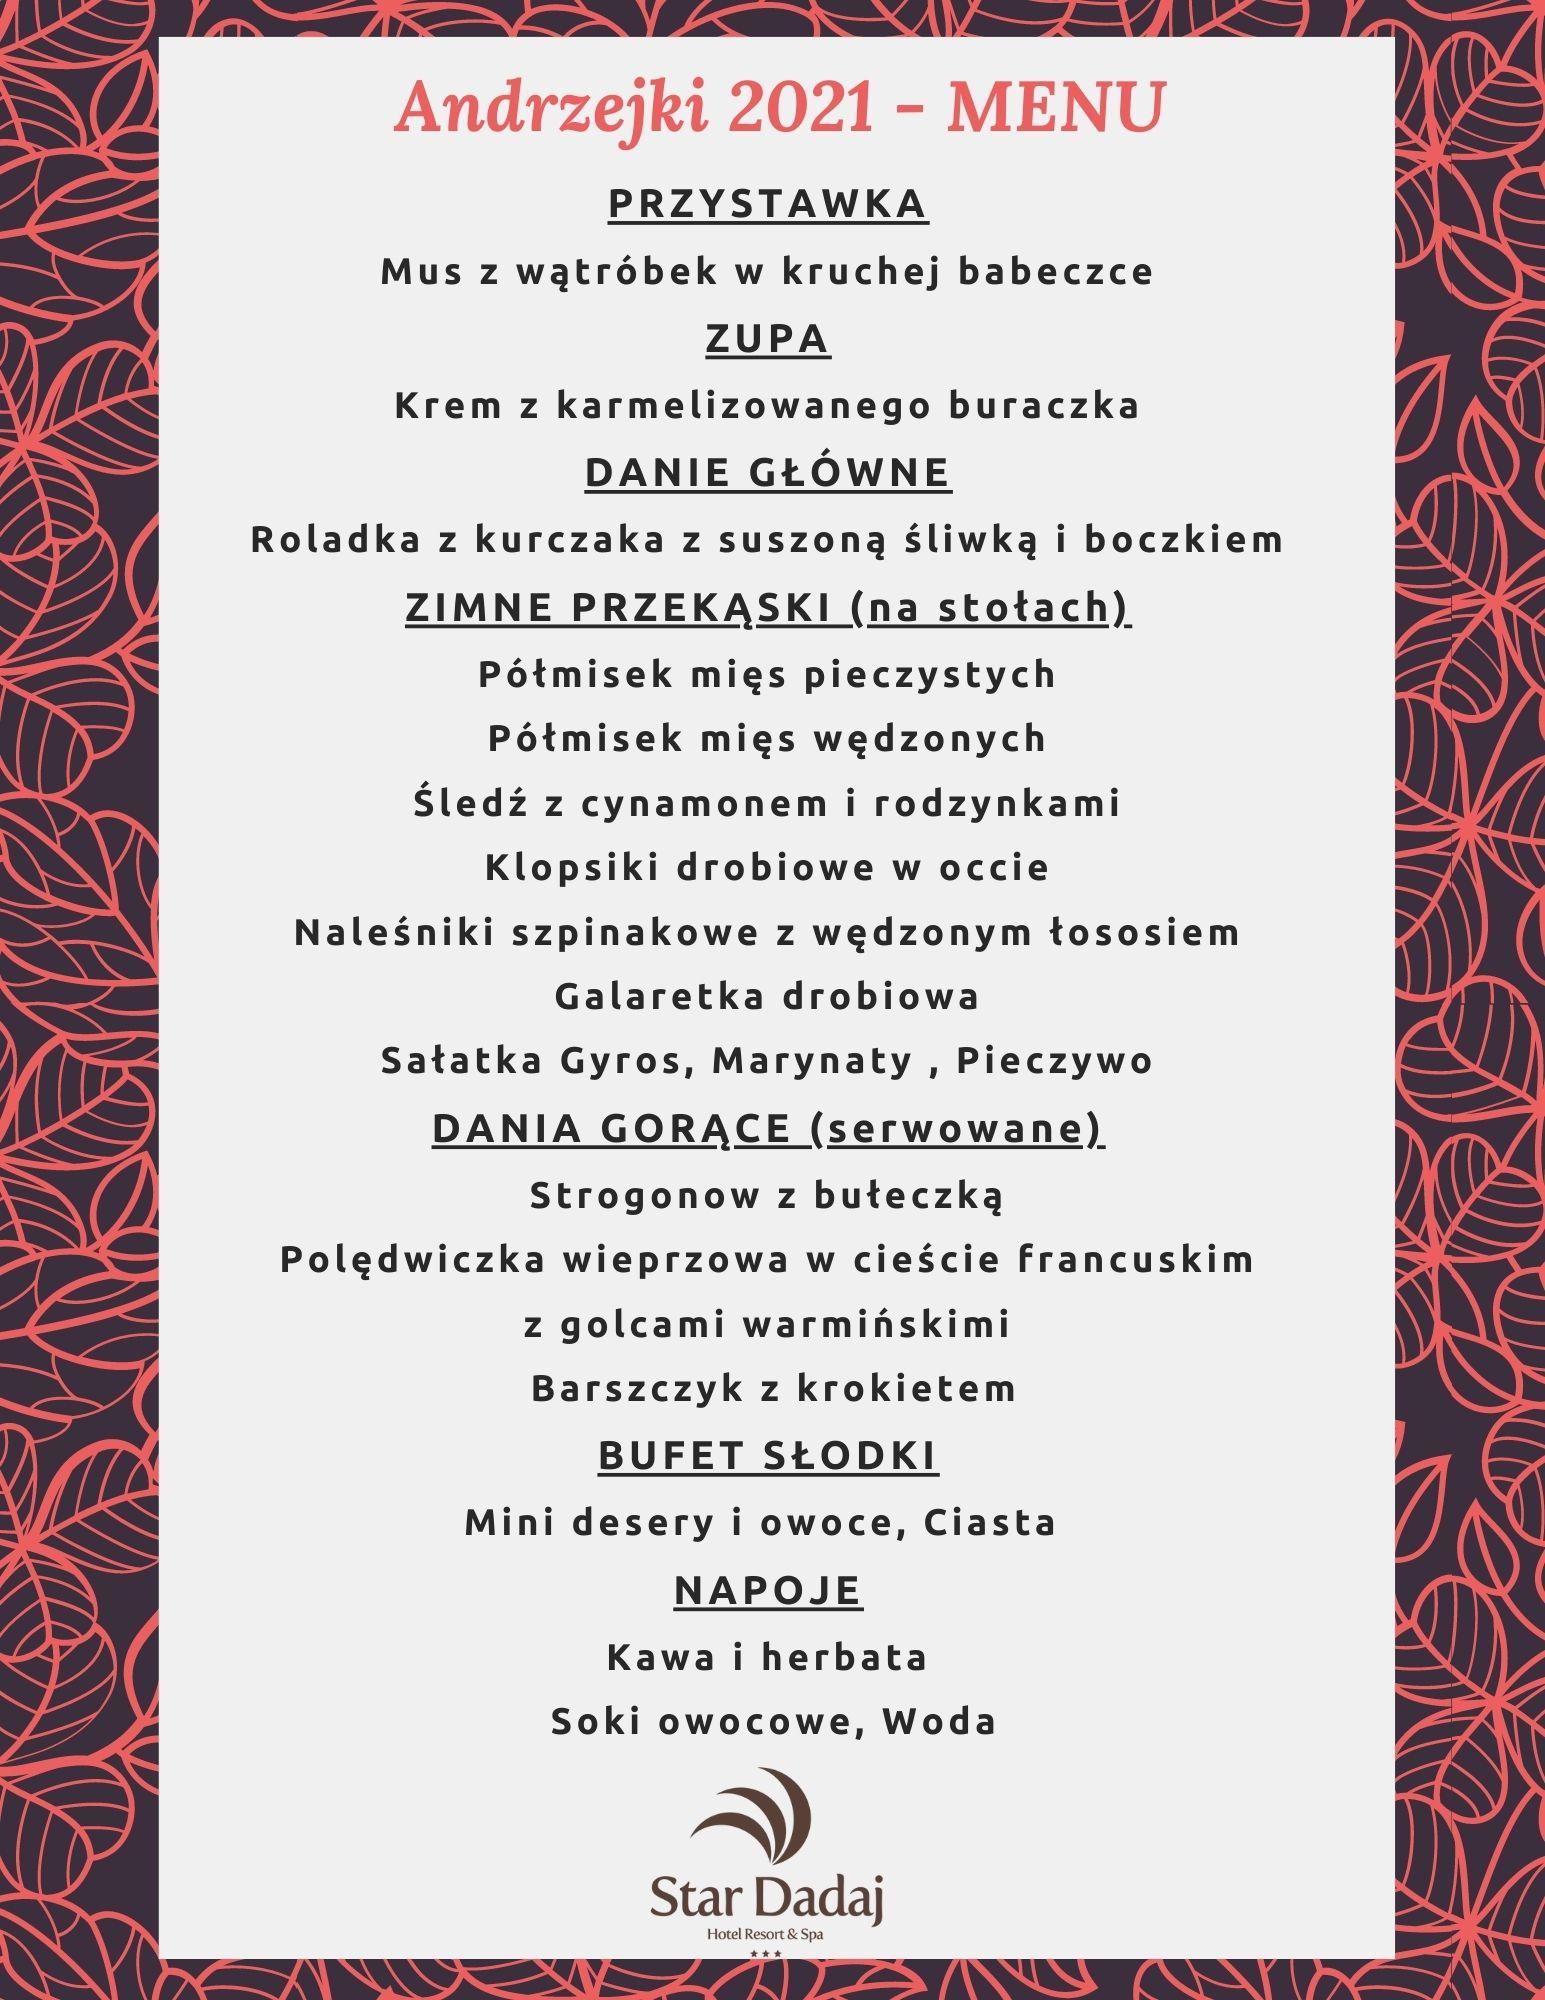 Menu Andrzejki